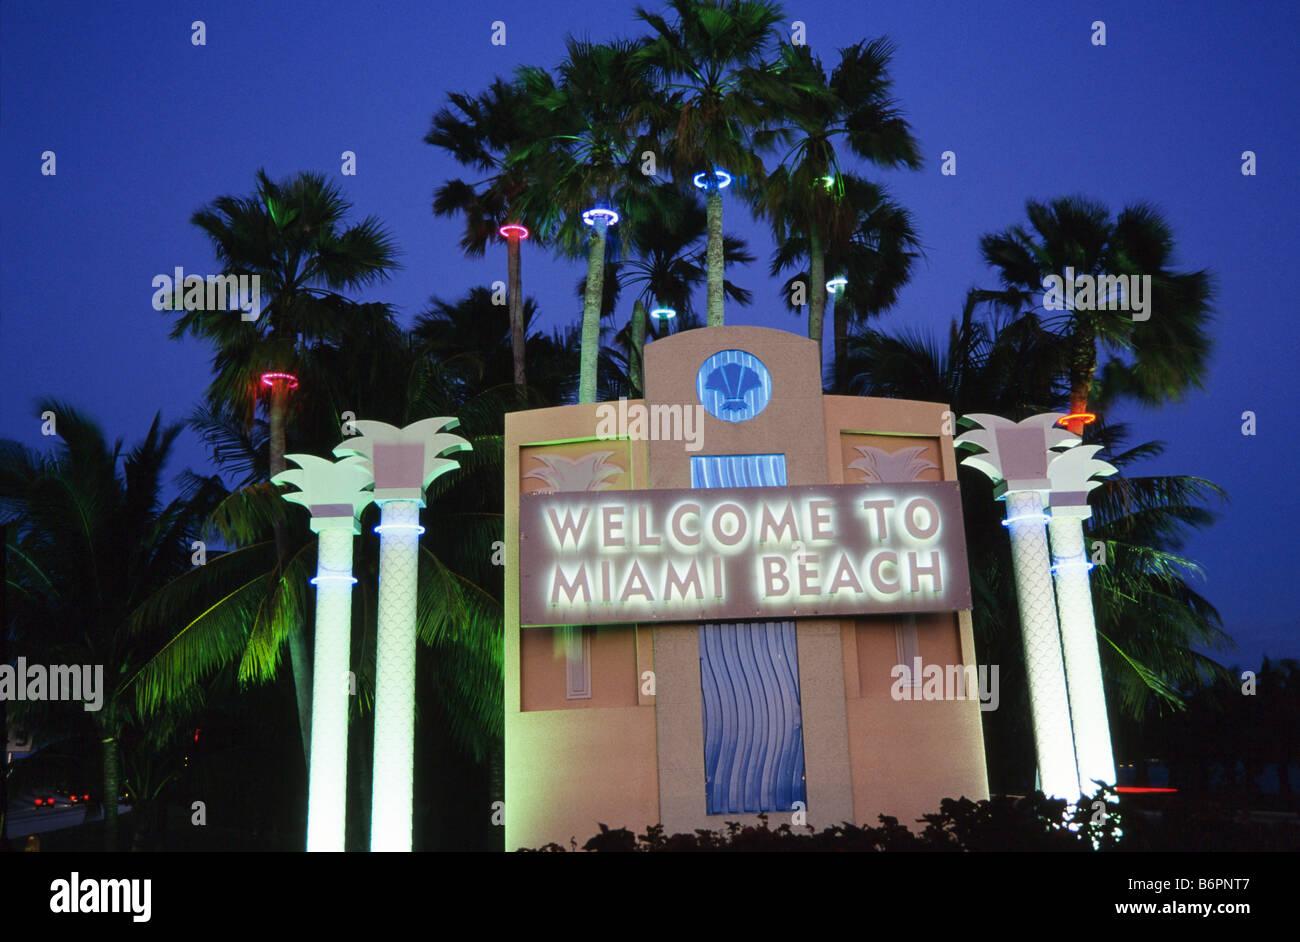 South Beach, Art Deco district, Miami Beach - Stock Image